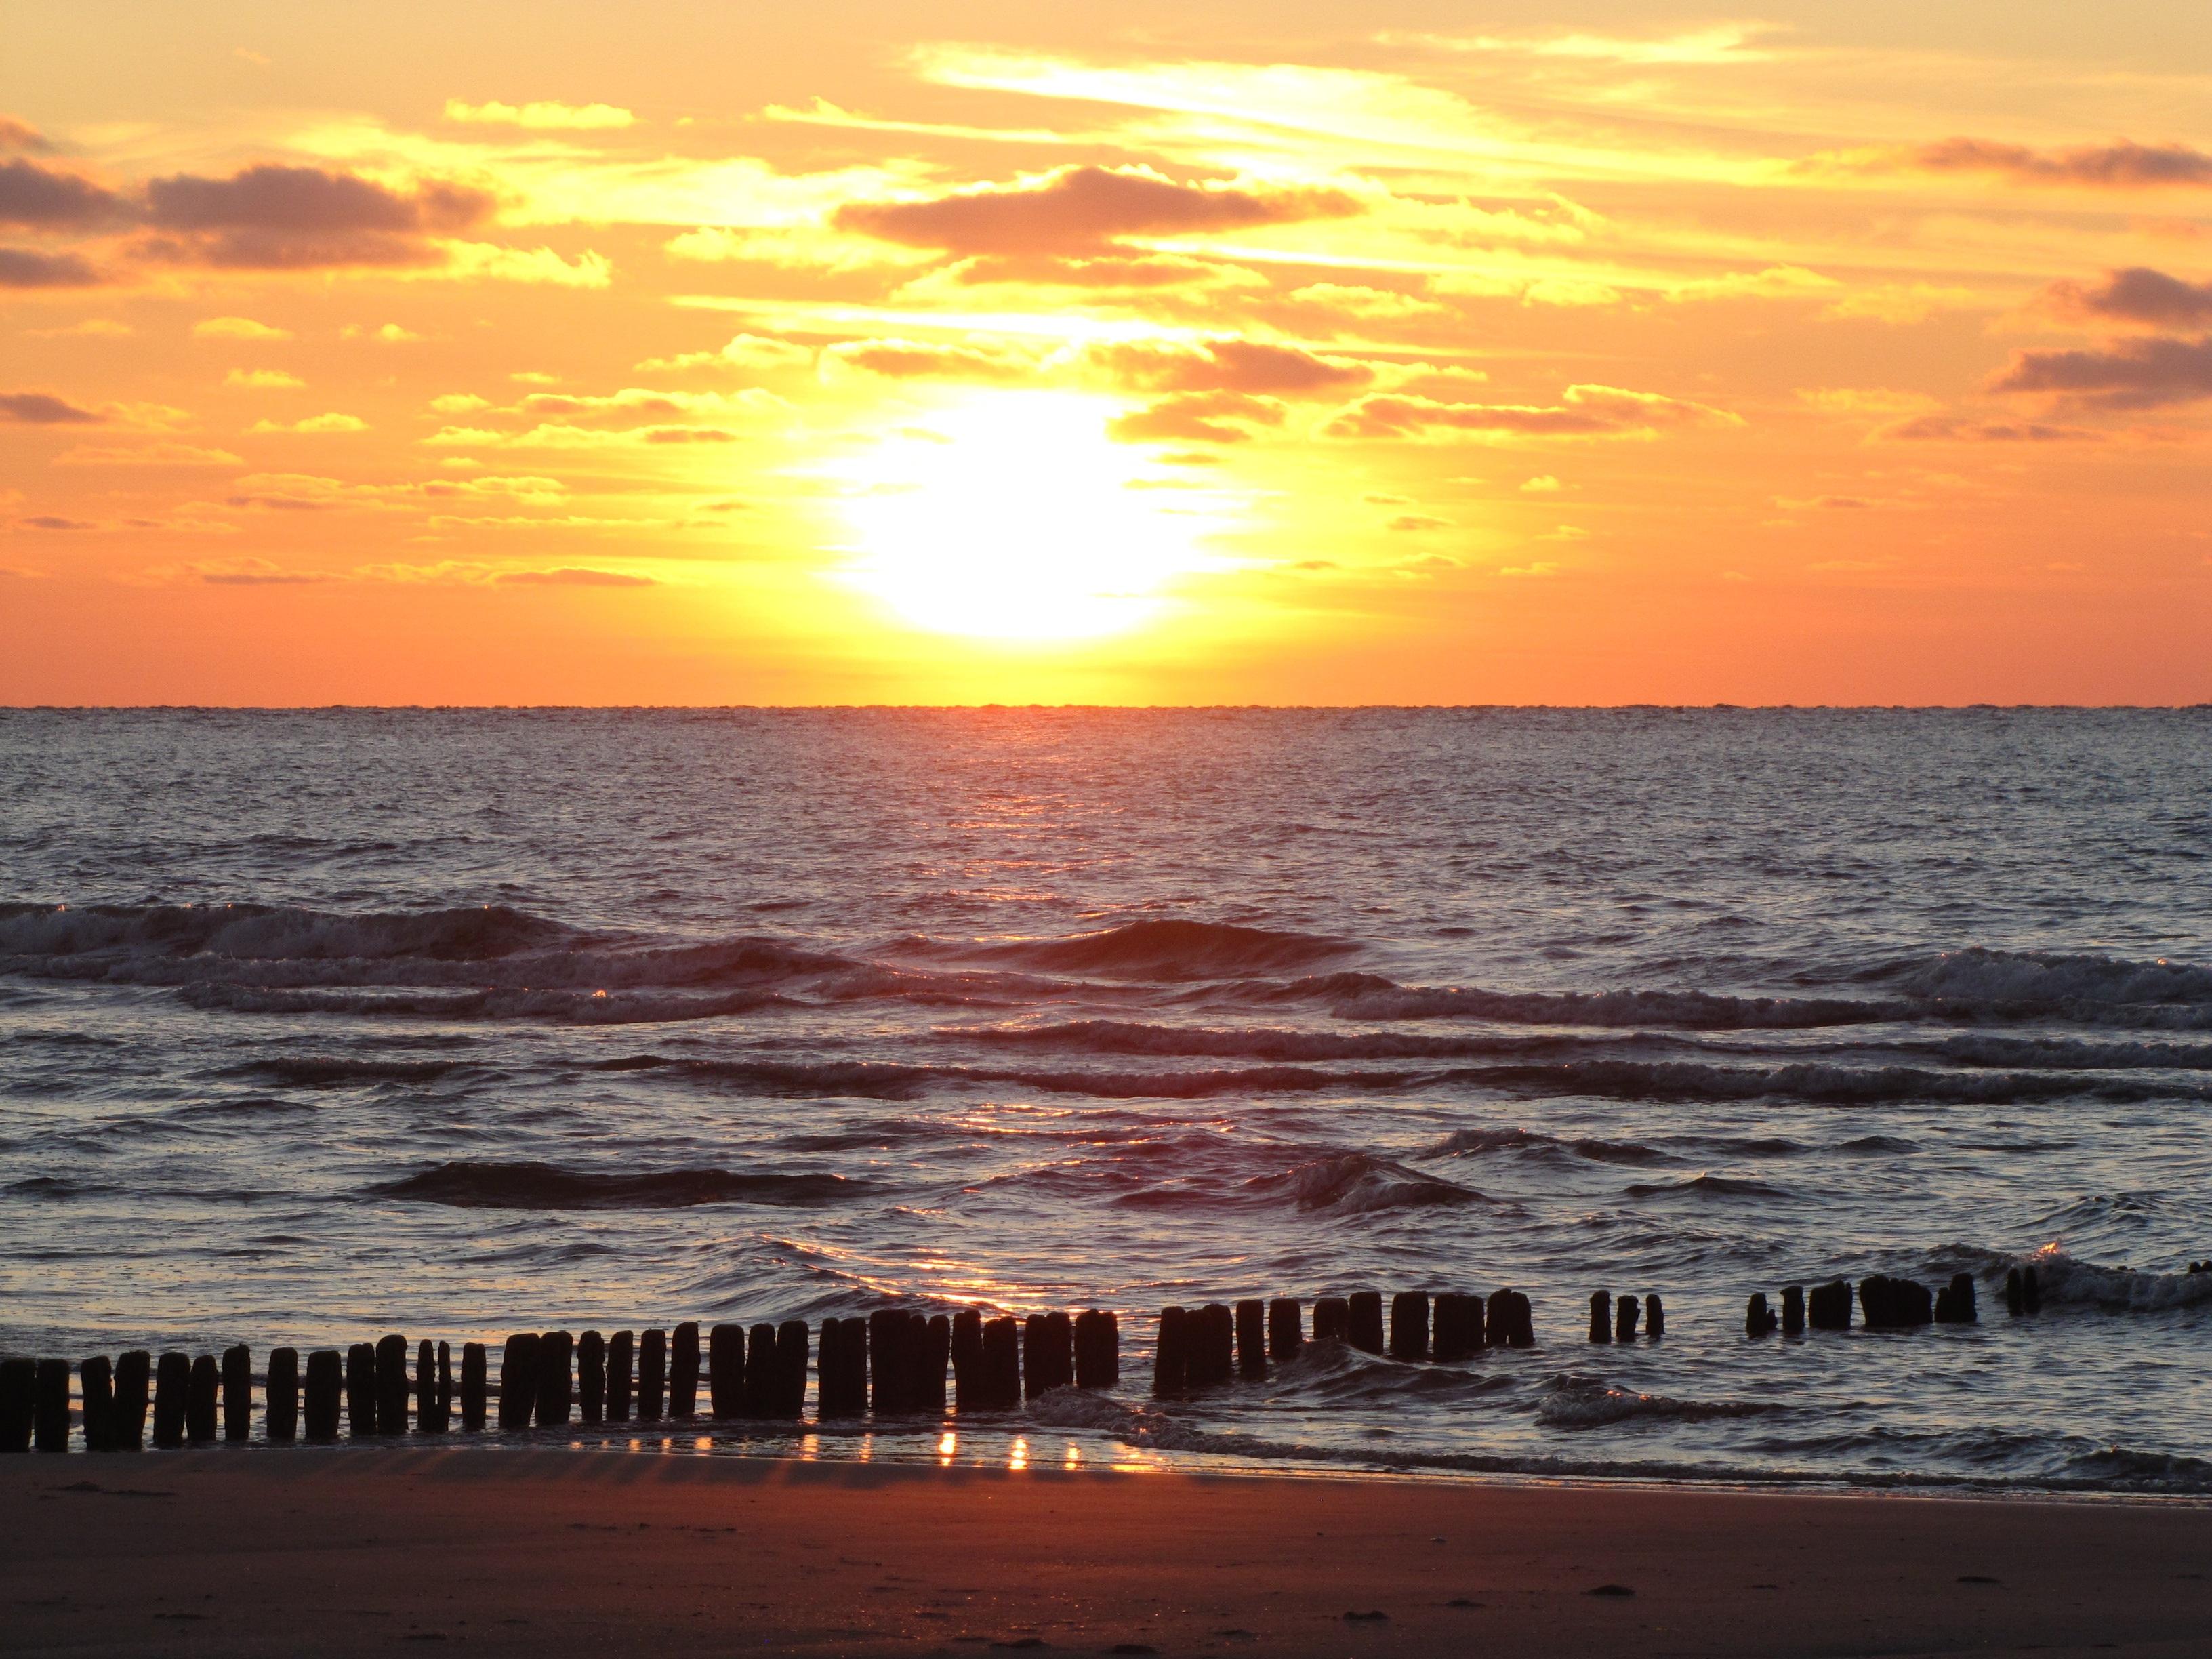 Strand nordsee sonnenuntergang  Kostenlose foto : Strand, Meer, Küste, Sand, Ozean, Horizont, Sonne ...